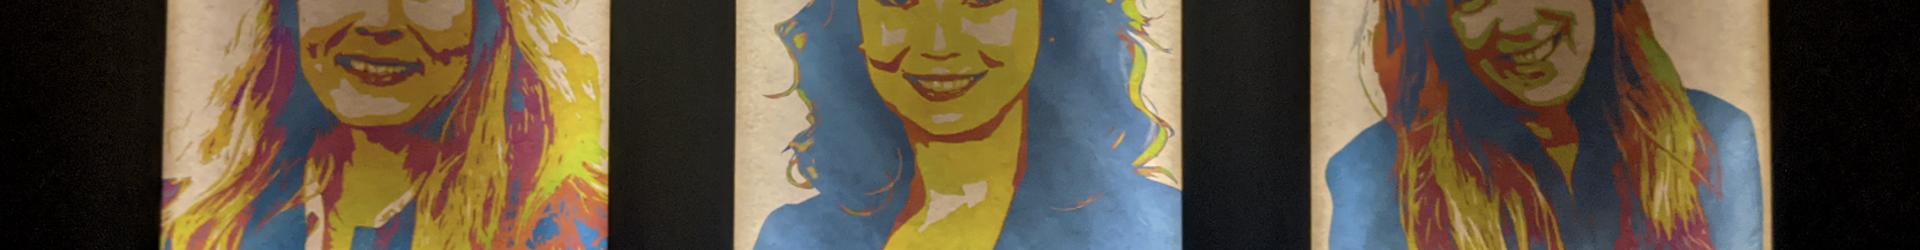 Kohler Fellow Blog Post: Inclusive Art, Aedan Gardill